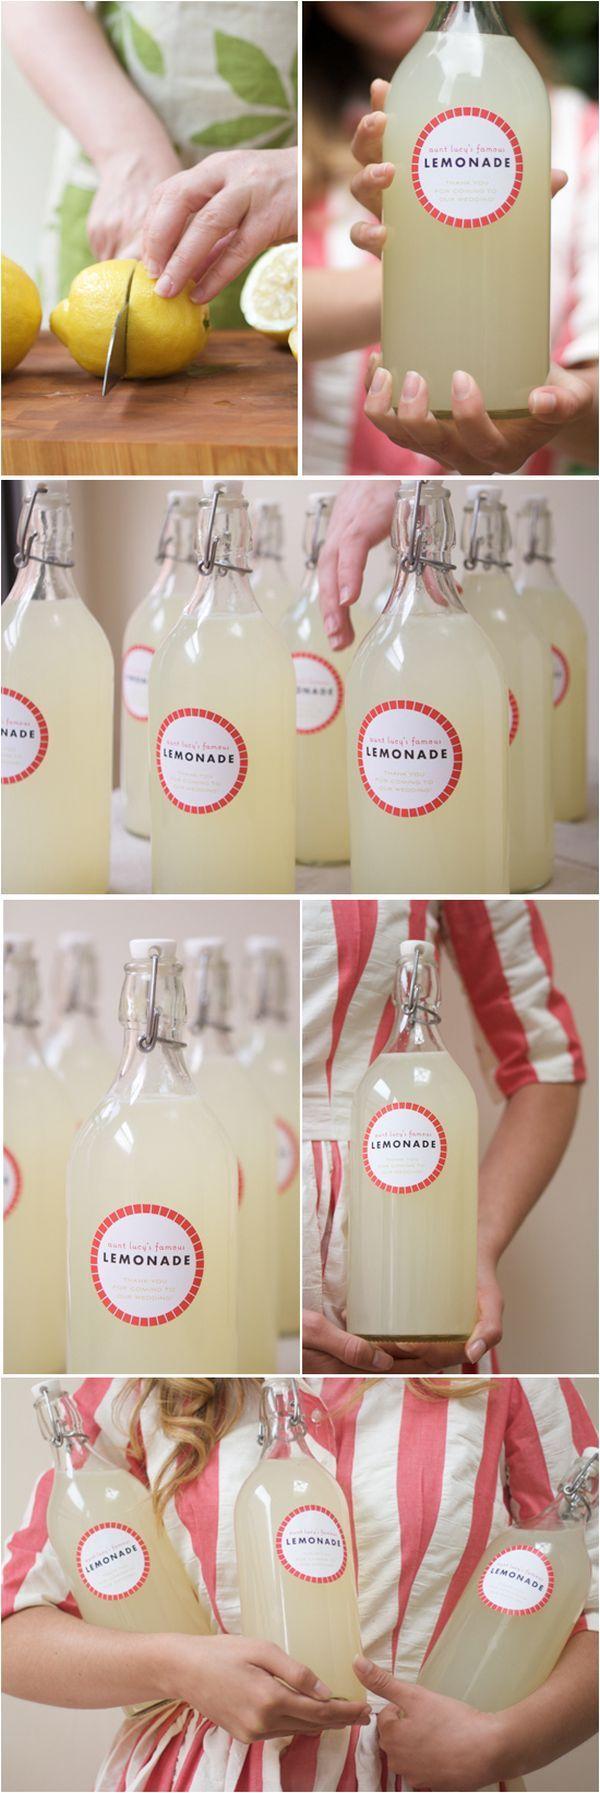 Great for a backyard summer wedding favor - Lemonade bottles! 35 Cute And Easy-To-Make Wedding Favor Ideas